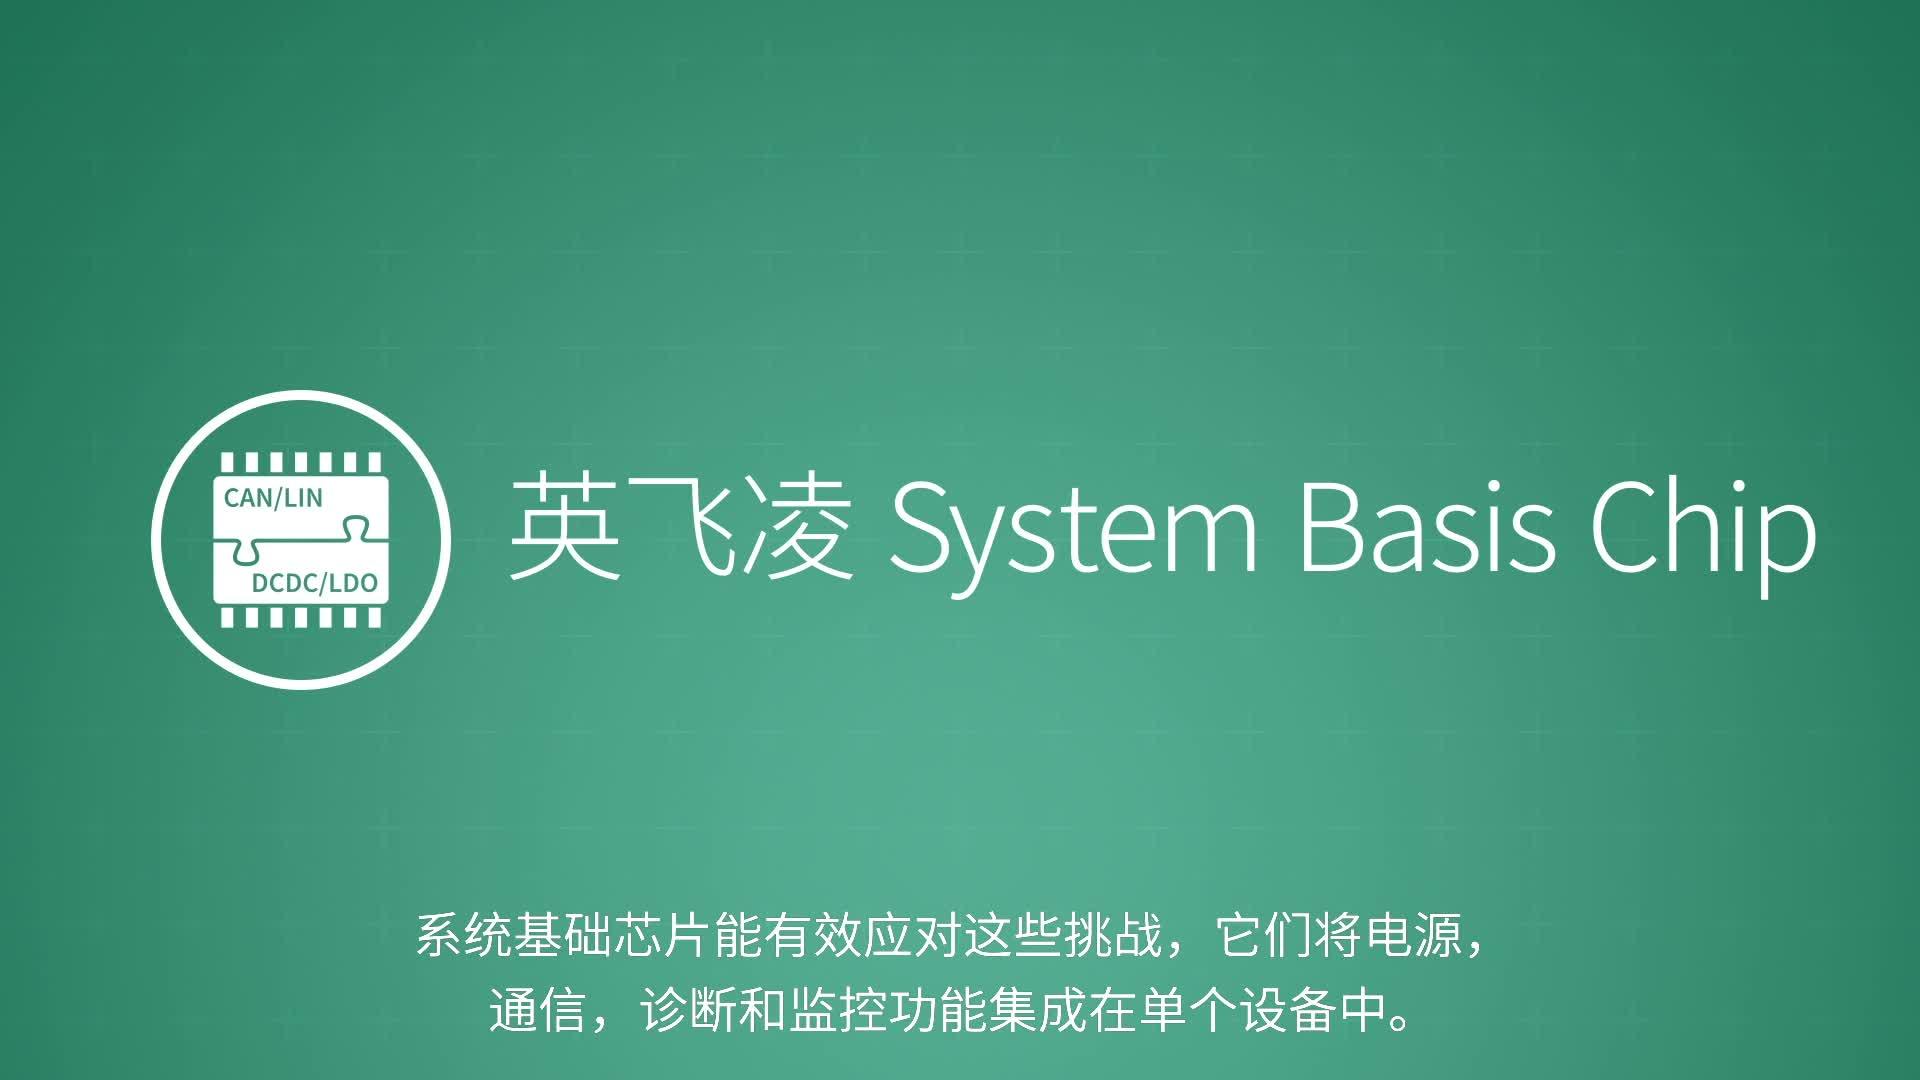 SBC (System Basis Chips) - 可扩展的汽车创新解决方案